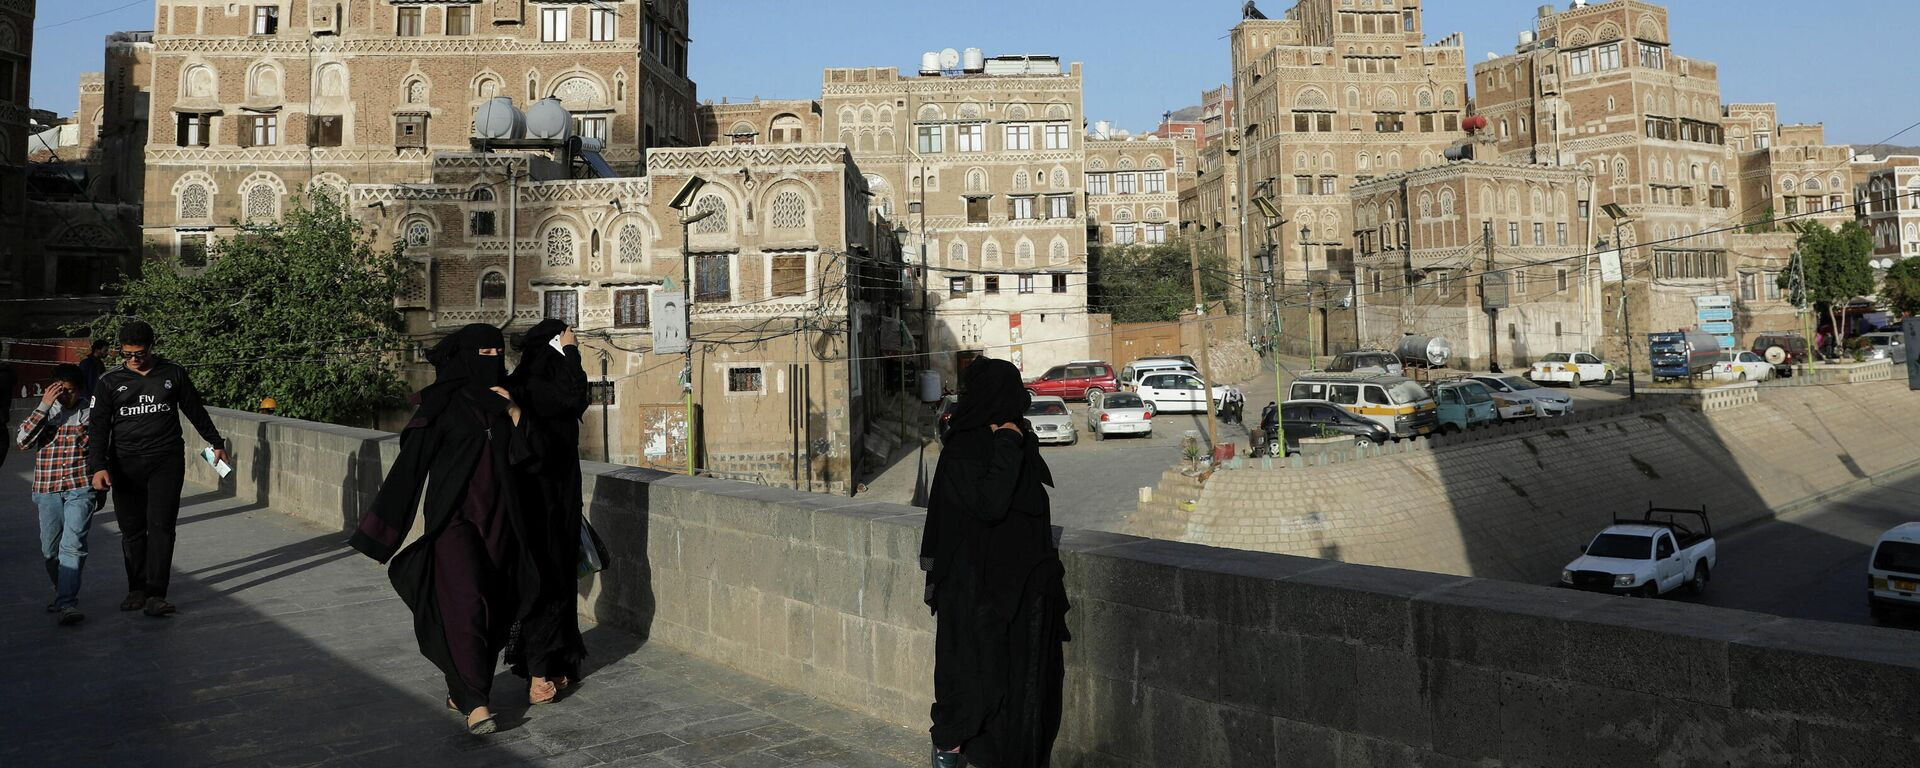 Situación en Yemen - Sputnik Mundo, 1920, 22.03.2021